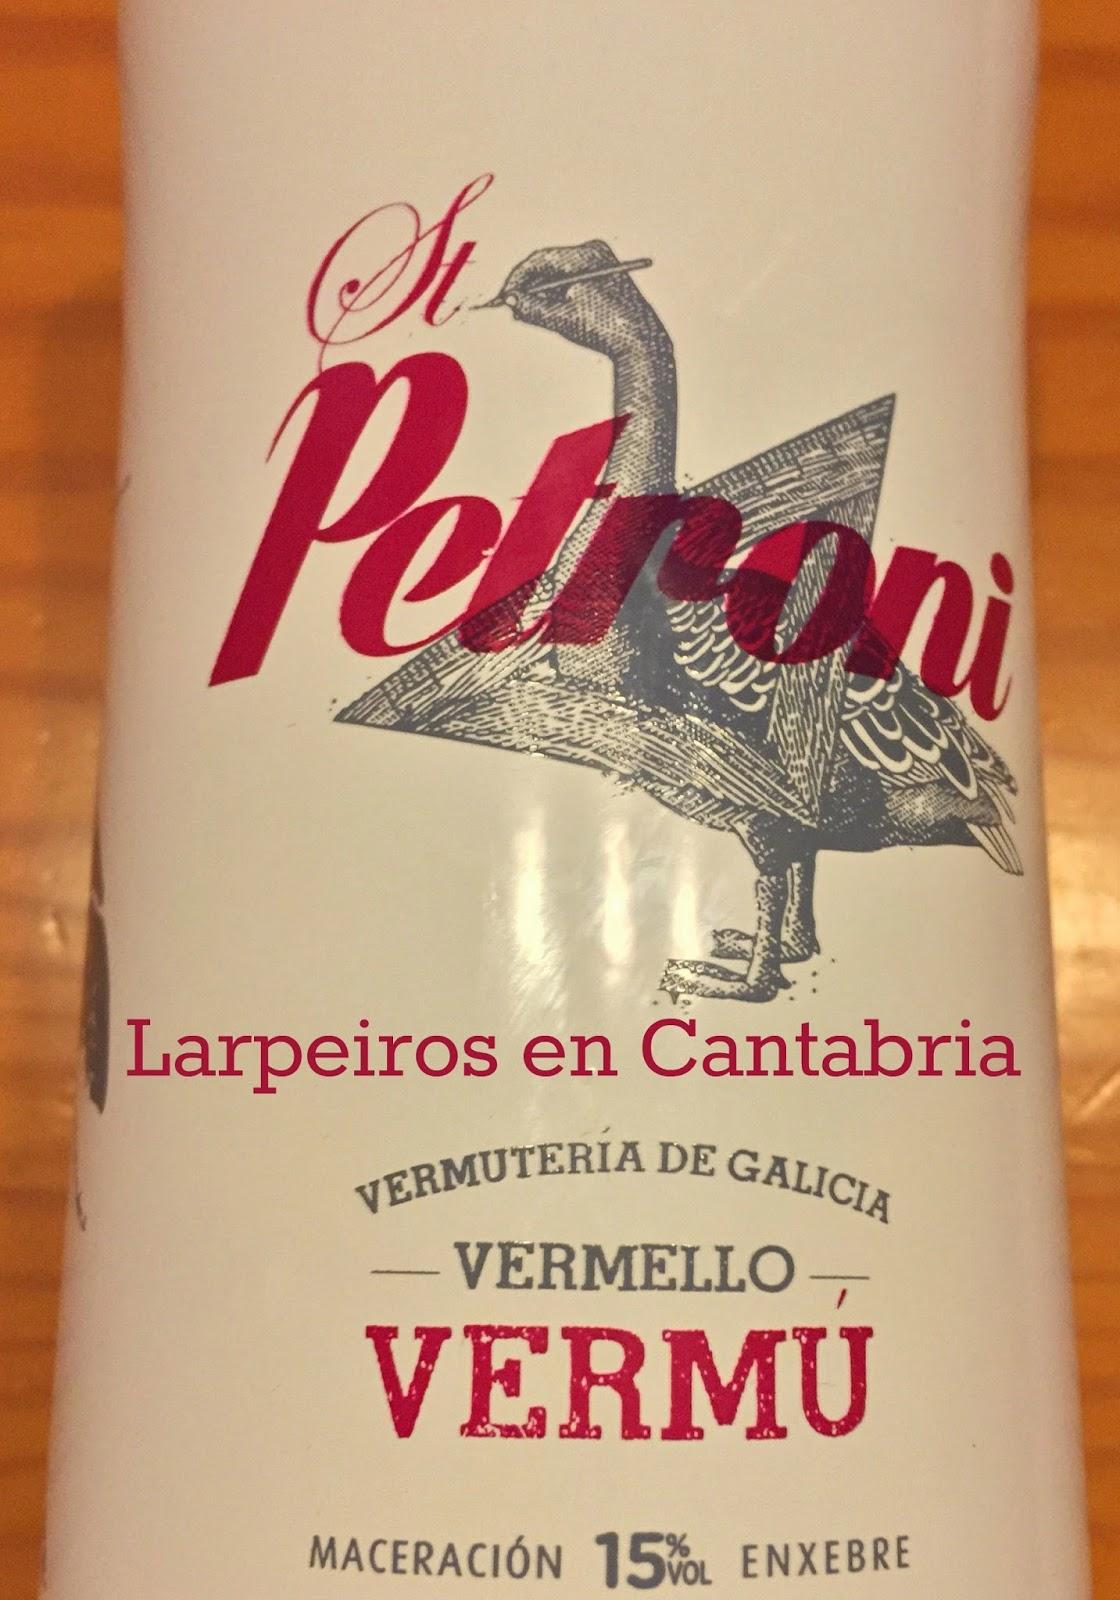 Vermú St. Petroni: Qué rico y vaya morriña nos entra